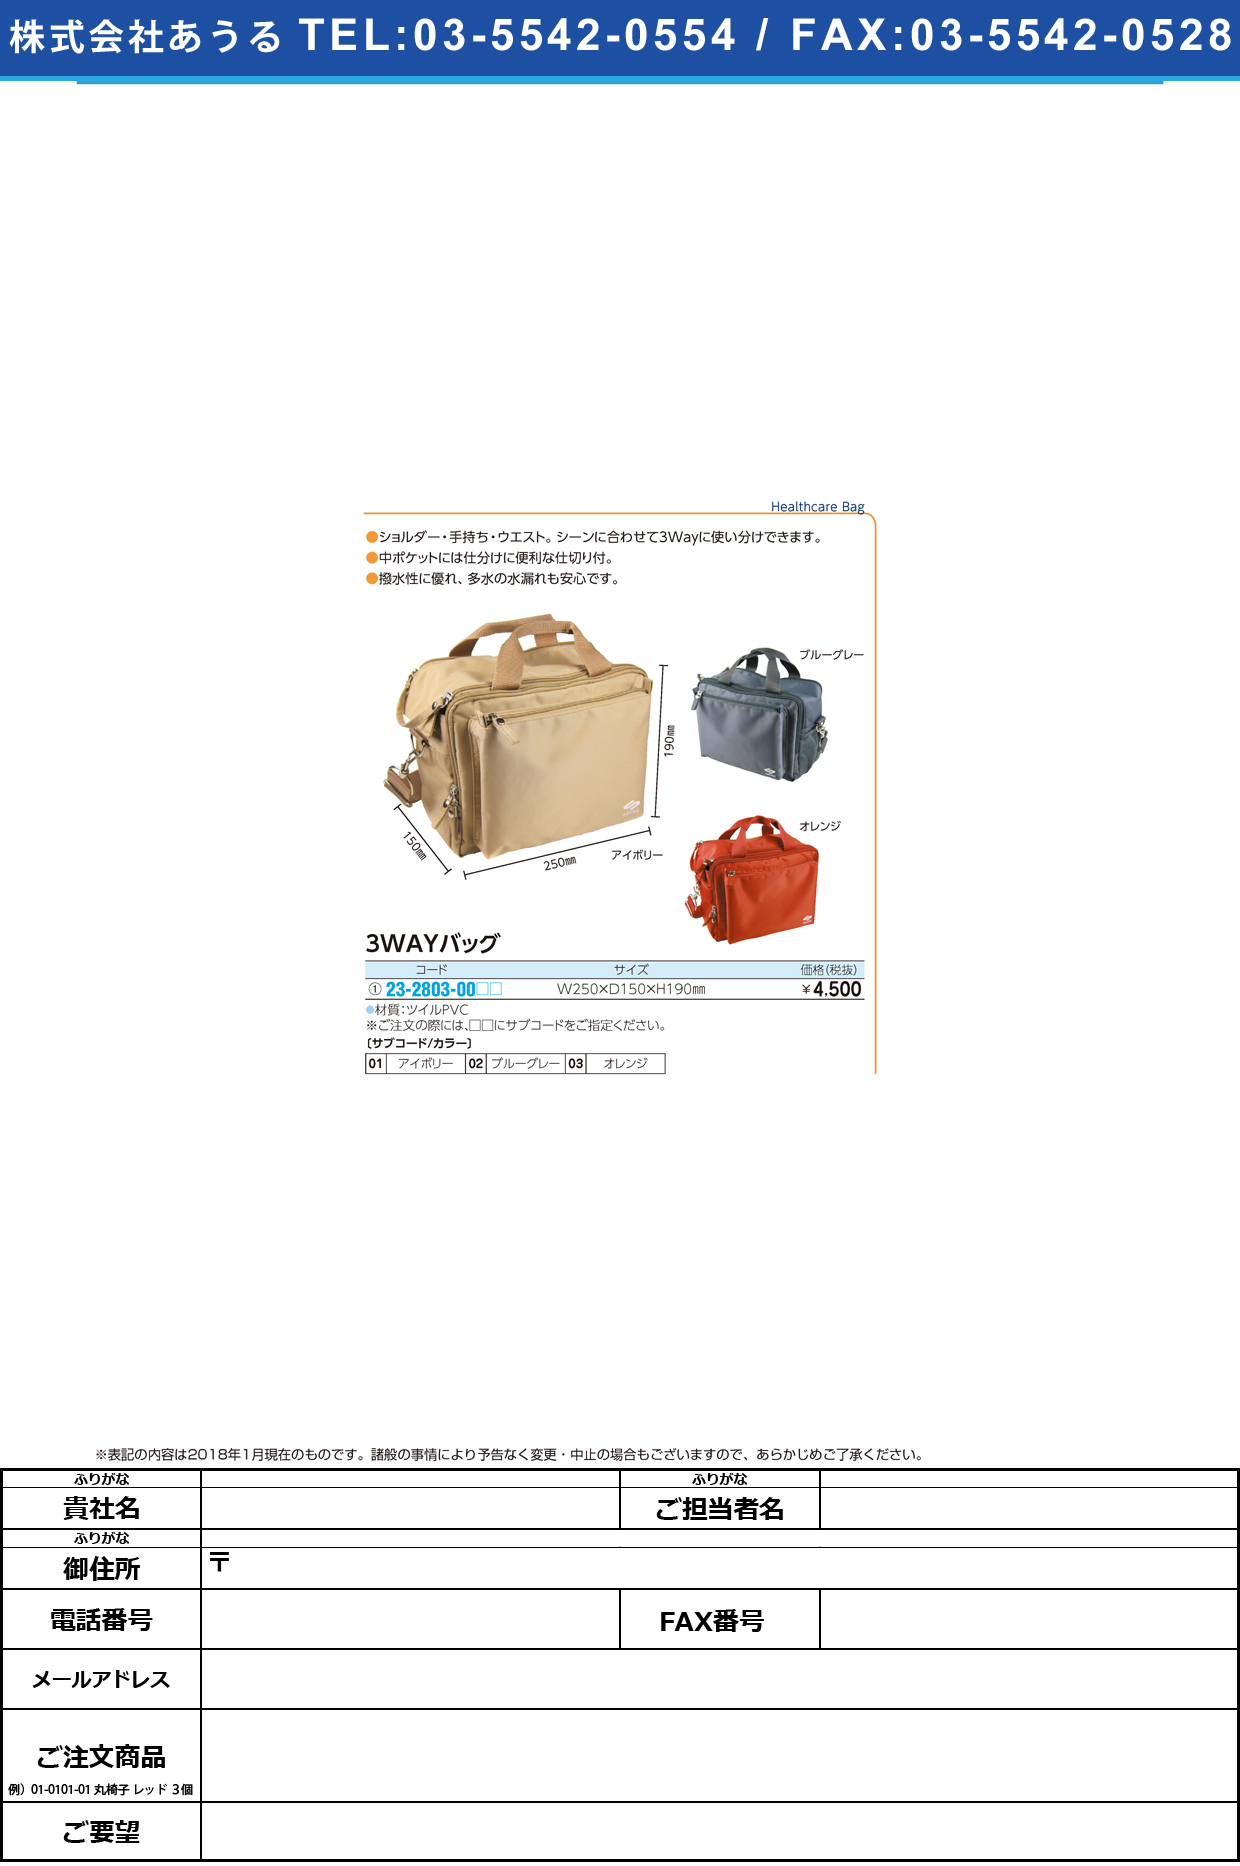 (23-2803-00)3WAYバッグ 25X15X19CM 3WAYバッグ アイボリー【1個単位】【2018年カタログ商品】